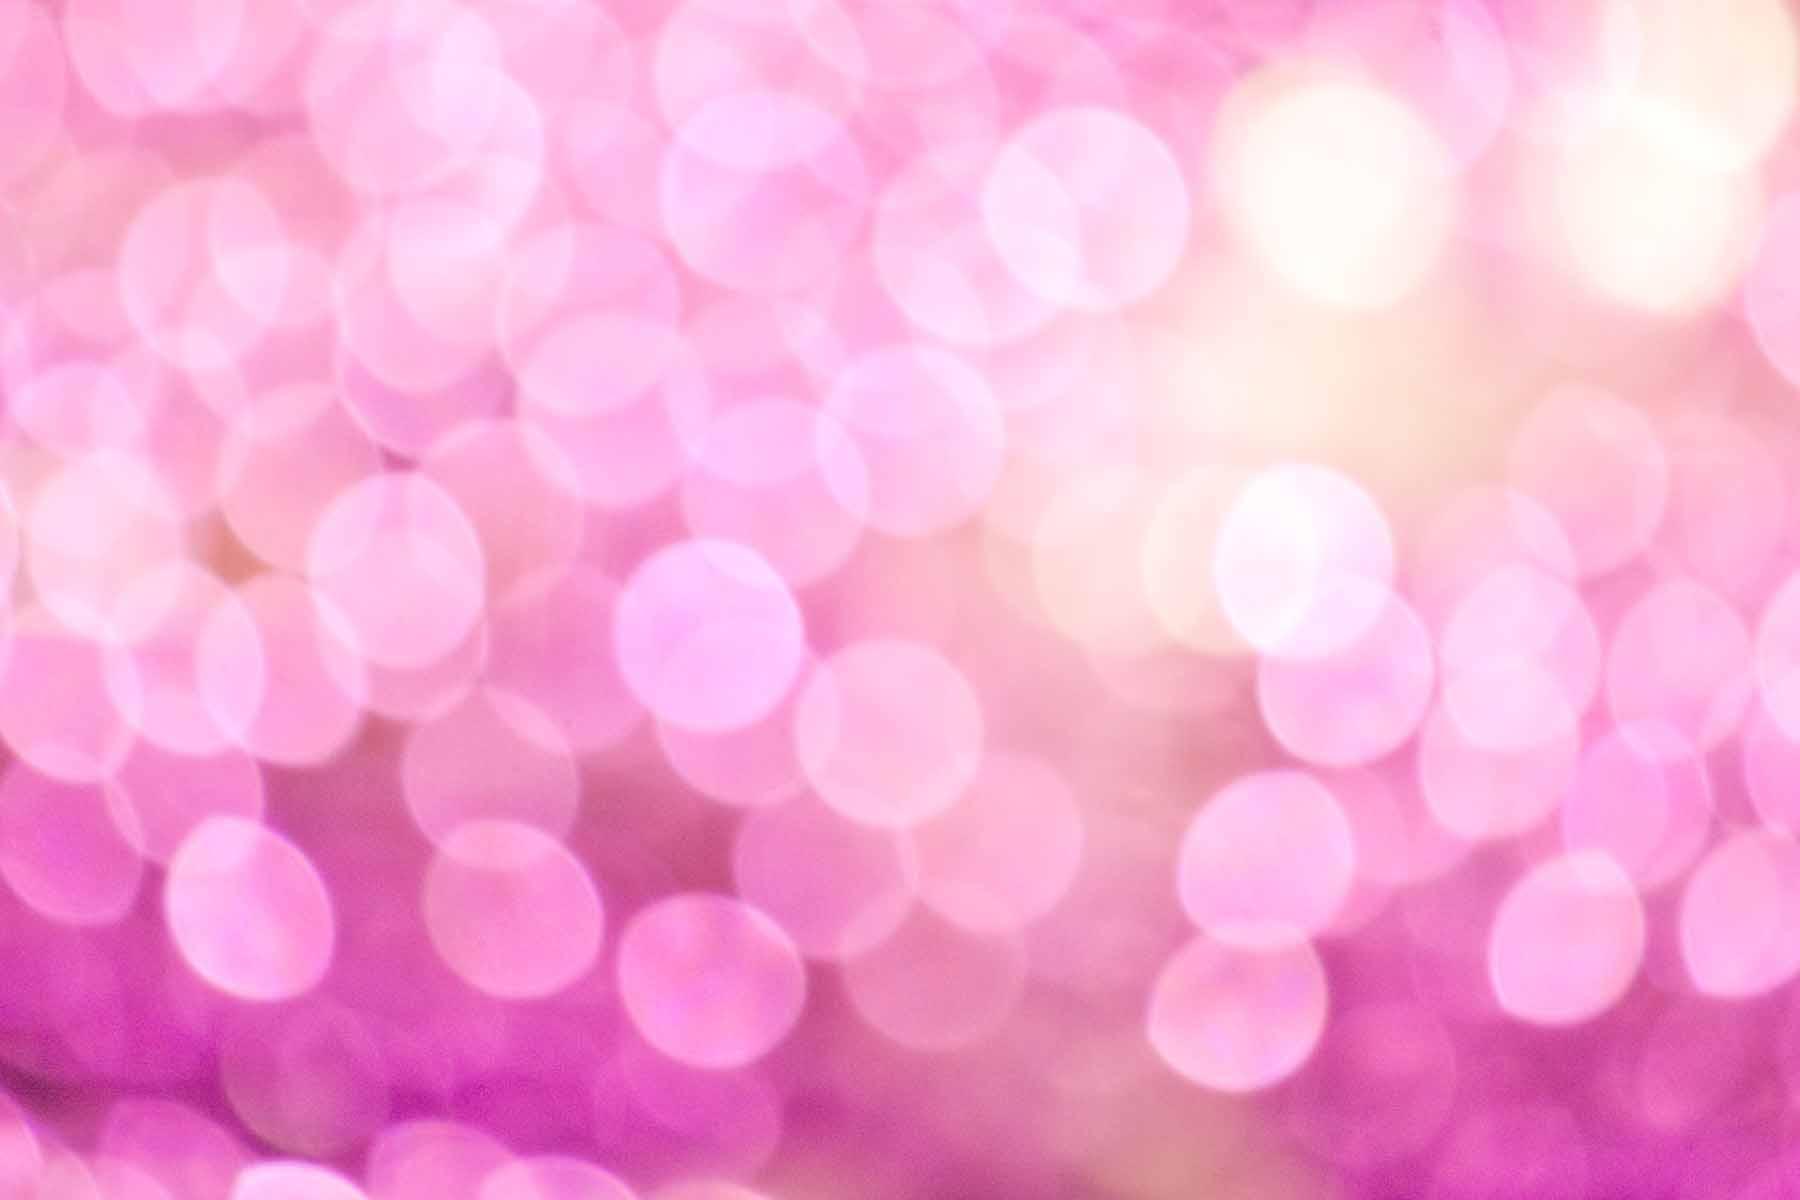 Pink bokeh texture photo